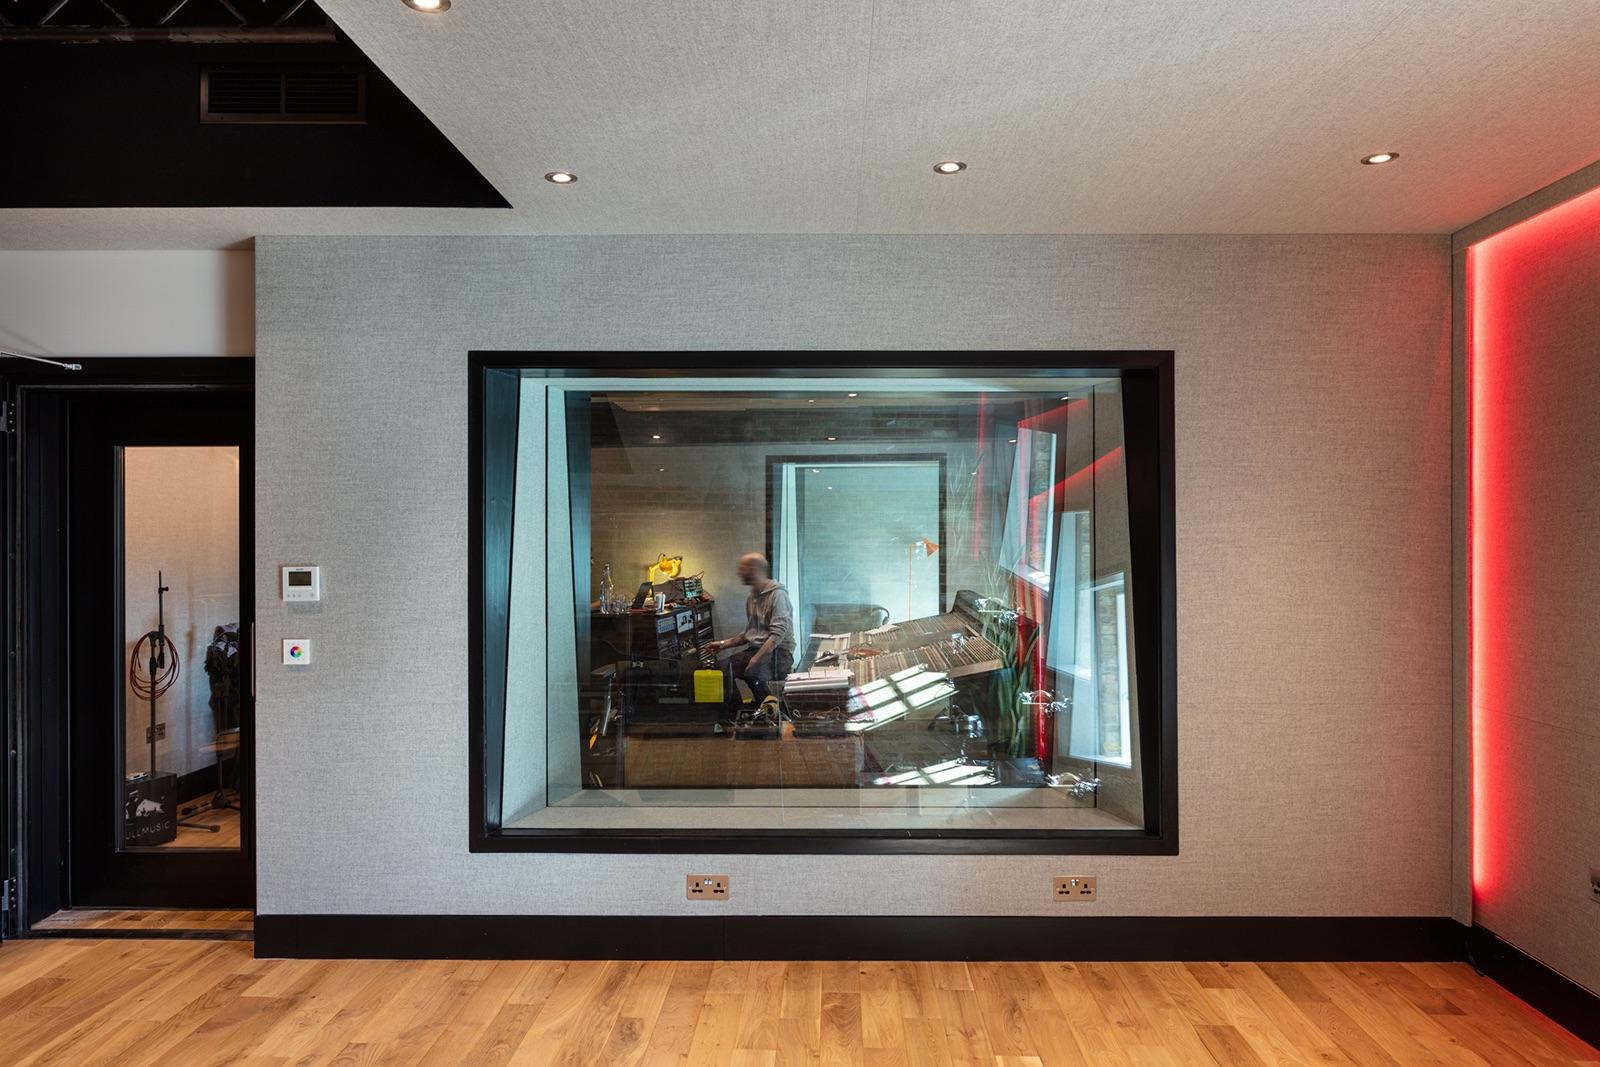 redbull-london-office-11